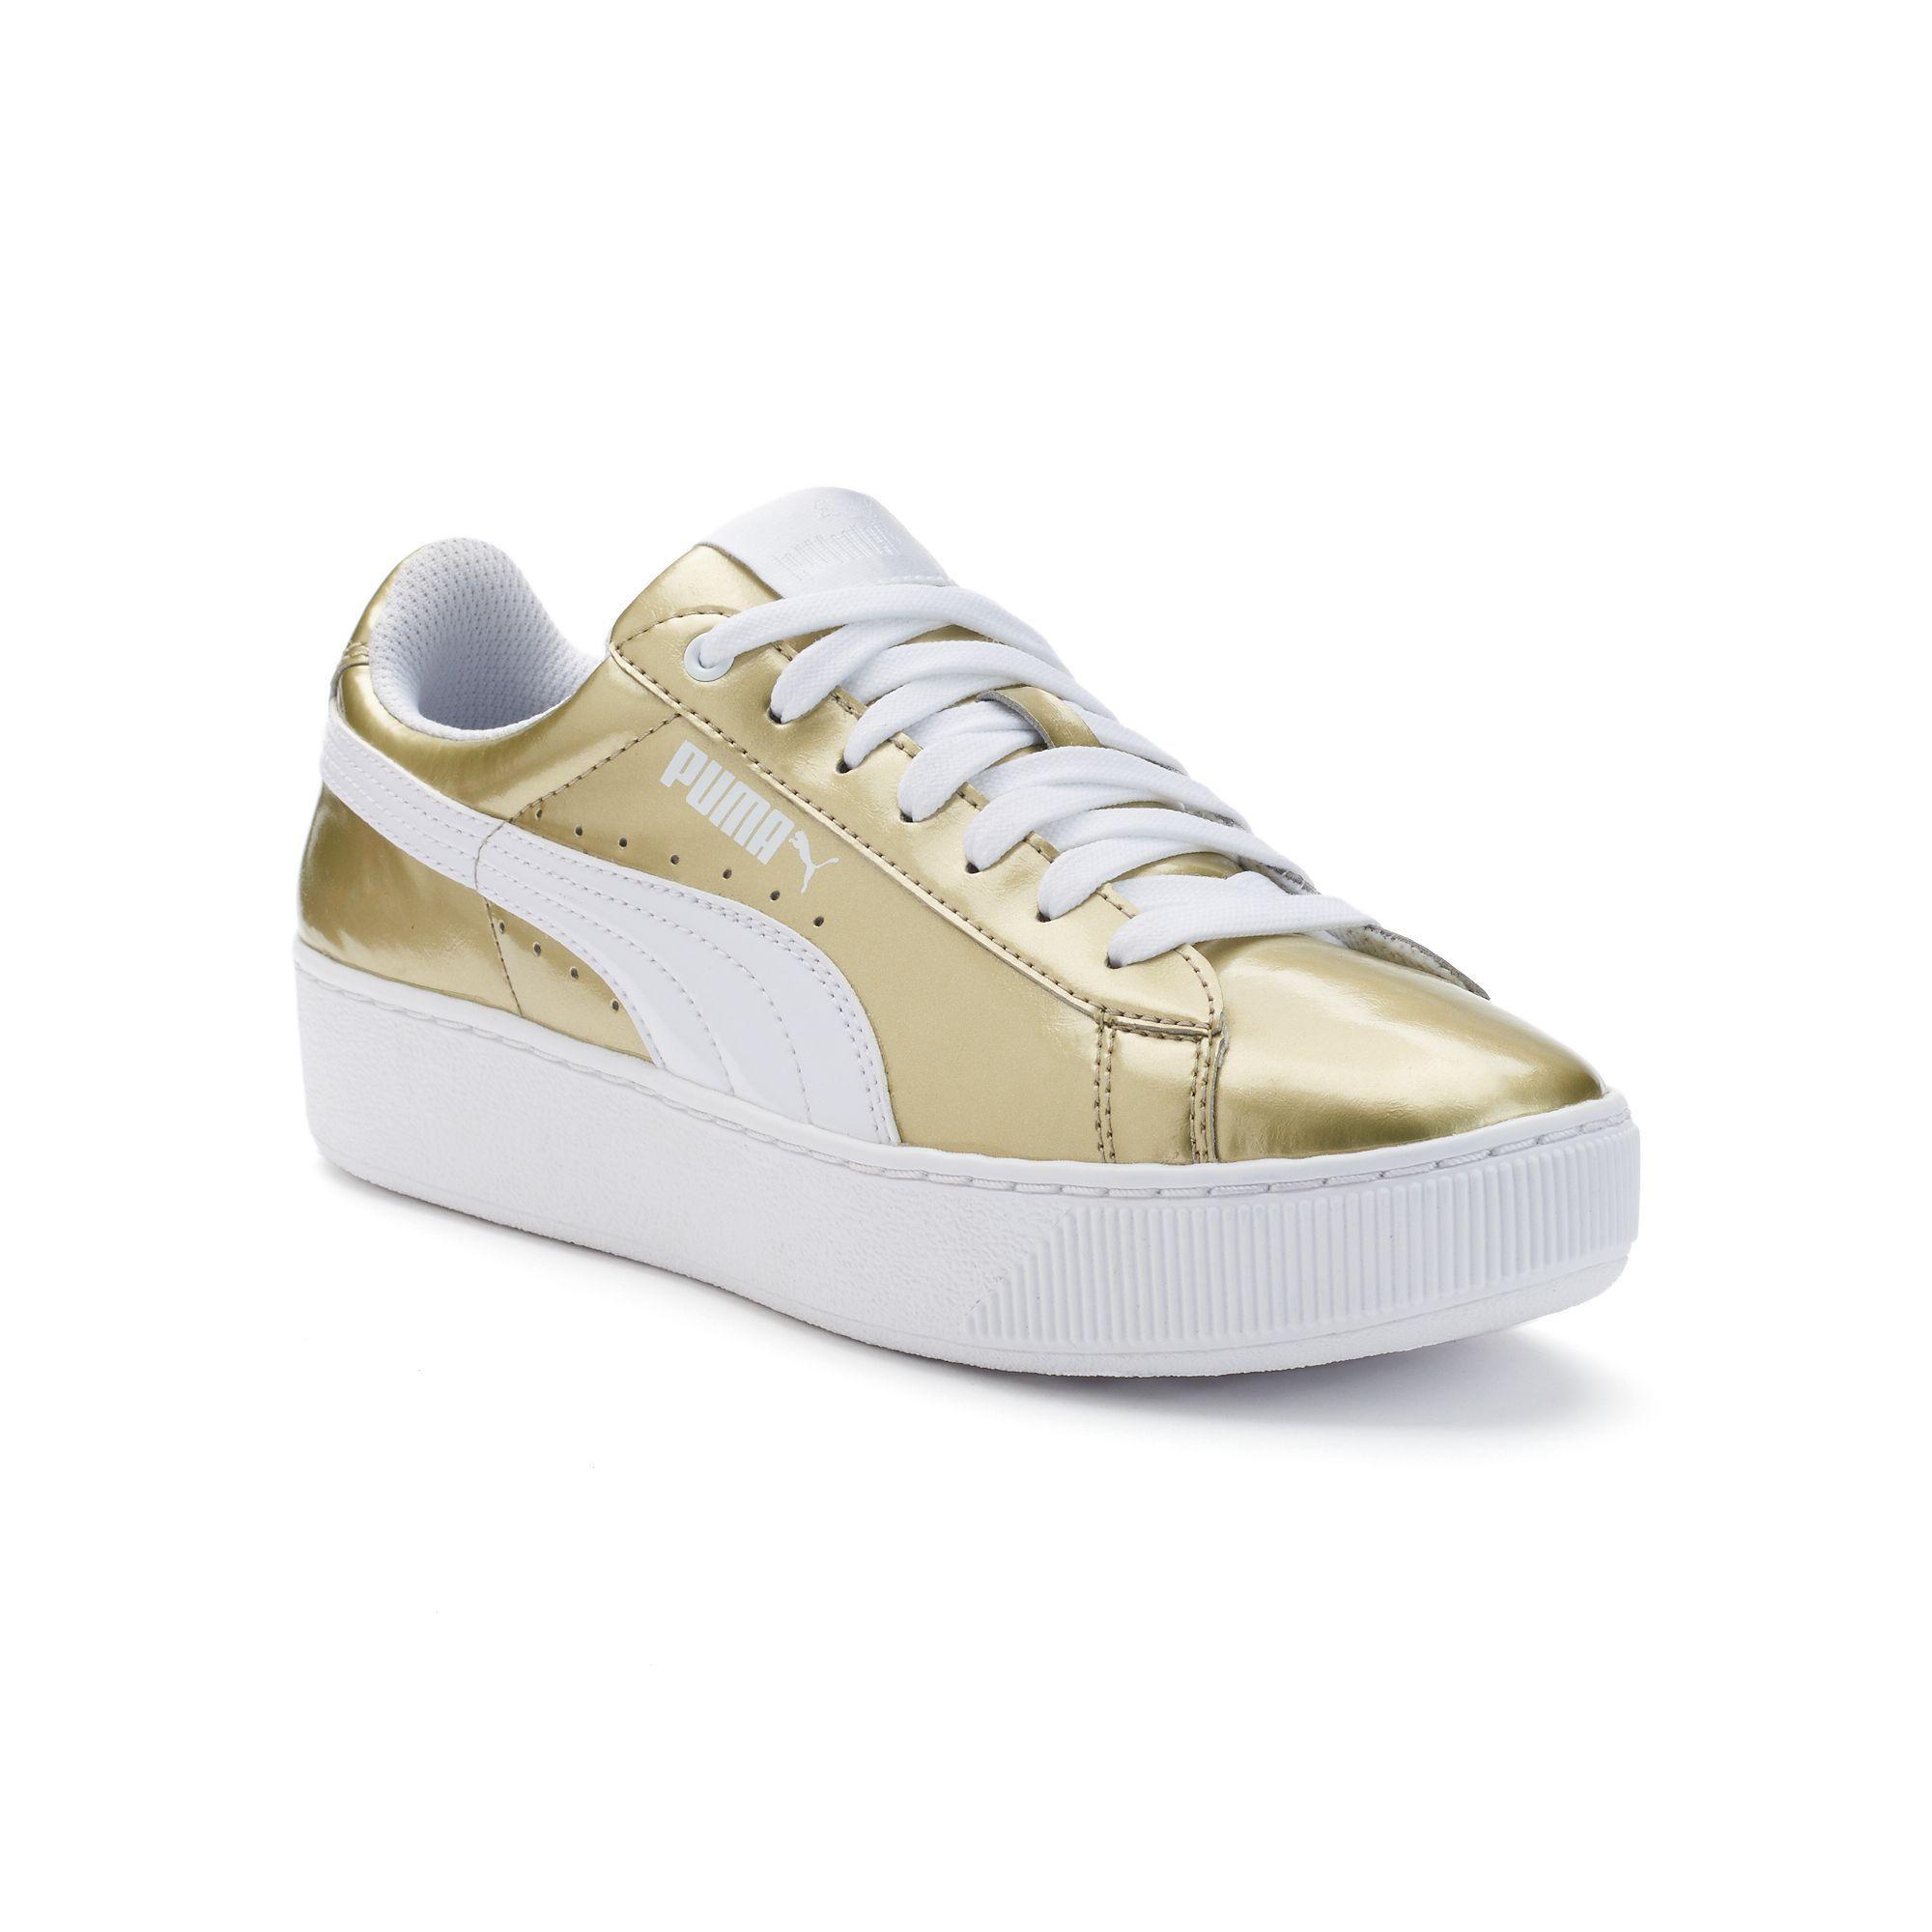 PUMA Vikky Platform Women s Metallic Shoes 8398af046